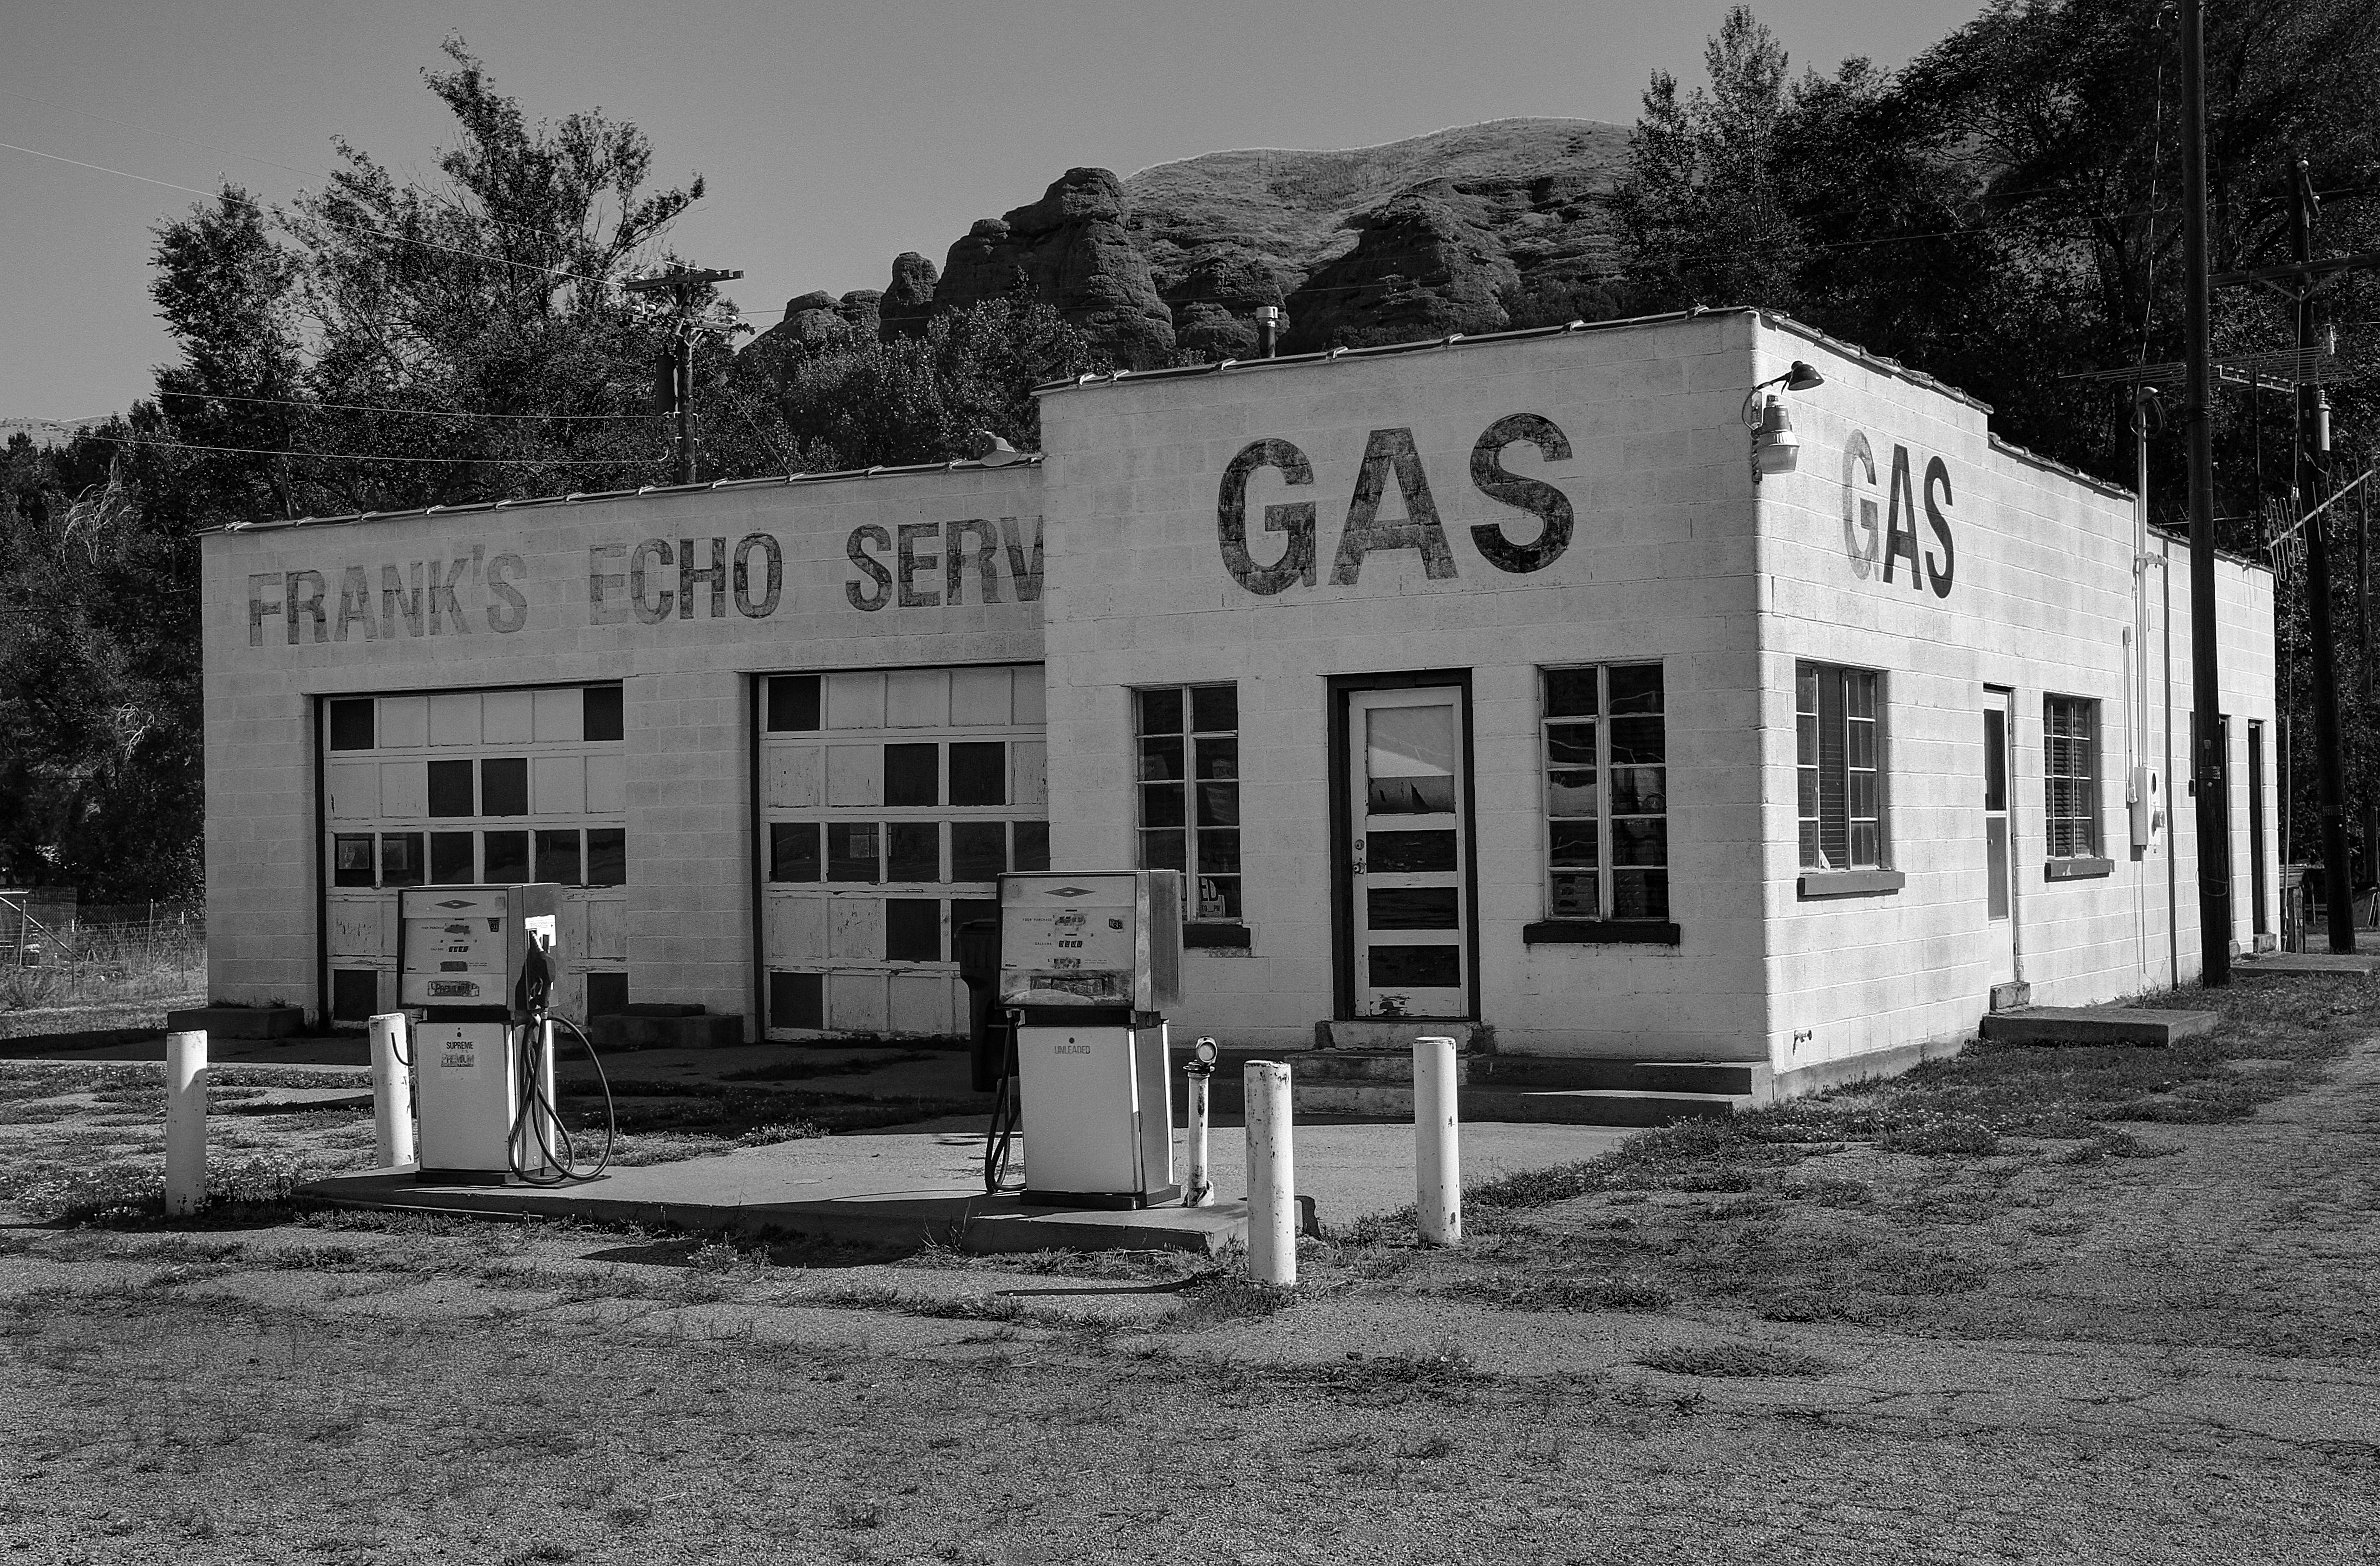 Frank's Echo Gas - Echo, Utah U.S.A. - September 7, 2016